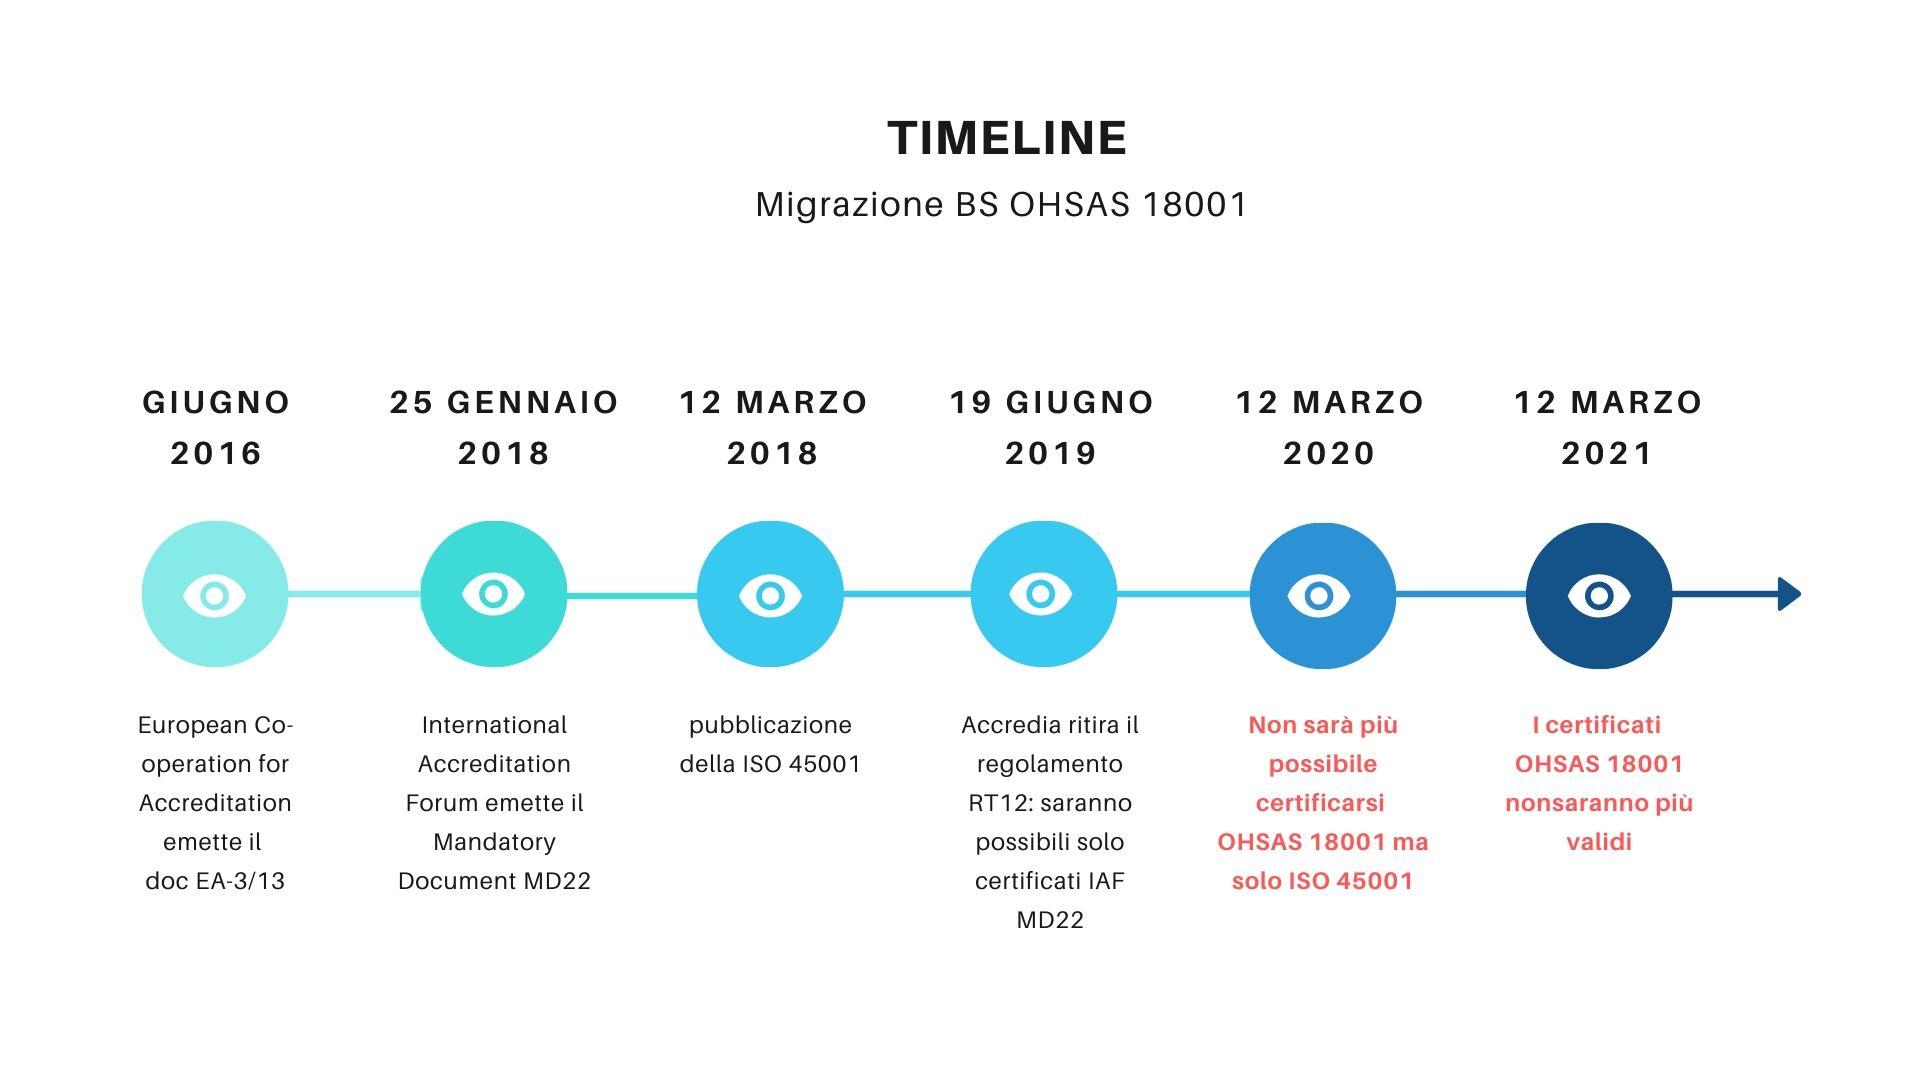 Timeline migrazione OHSAS 18001 NordPas